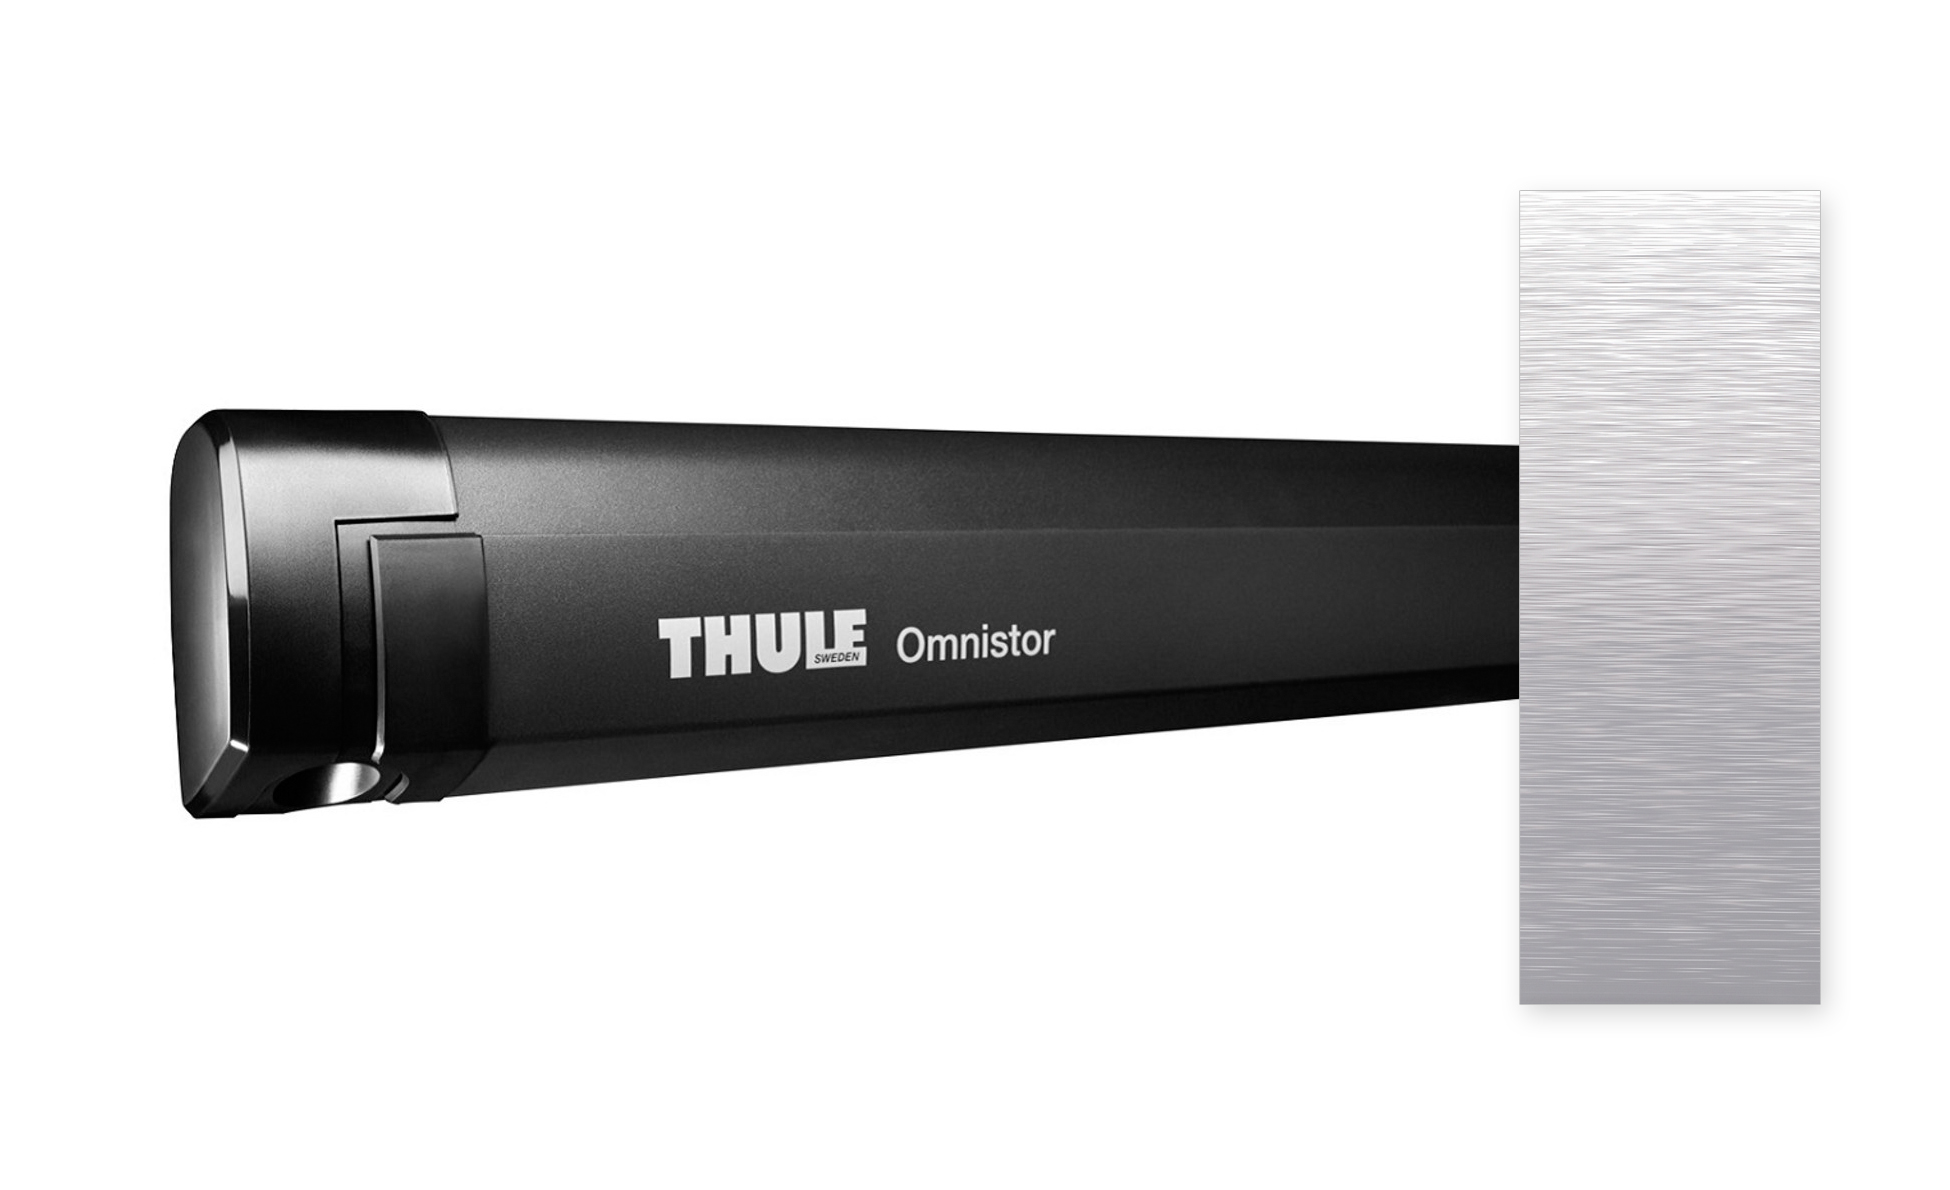 Thule Omnistor 5200 anthrazit 350x250 cm, Mystic Grau